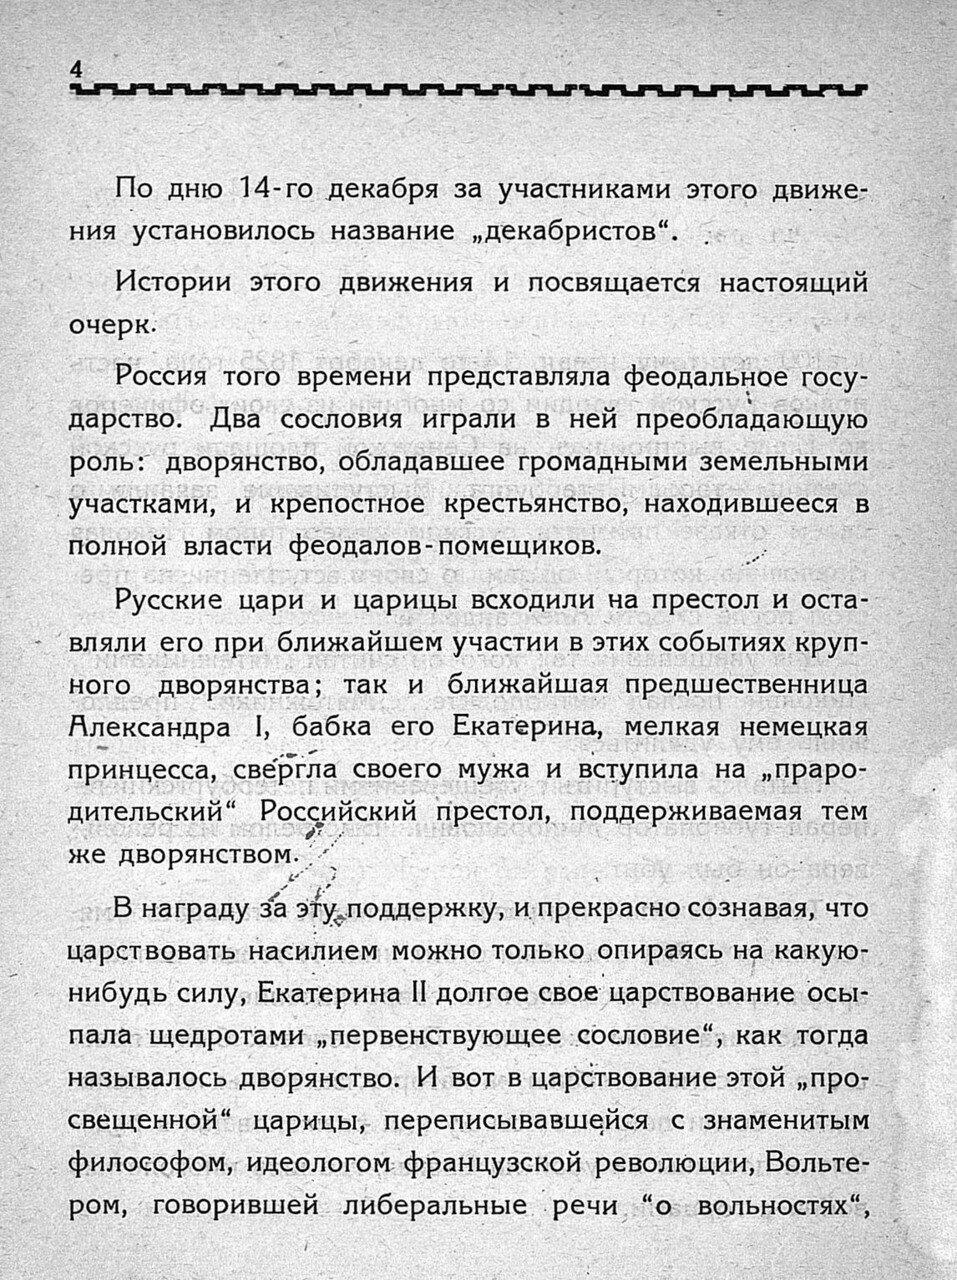 https://img-fotki.yandex.ru/get/153157/199368979.23/0_1bfac8_13de578f_XXXL.jpg